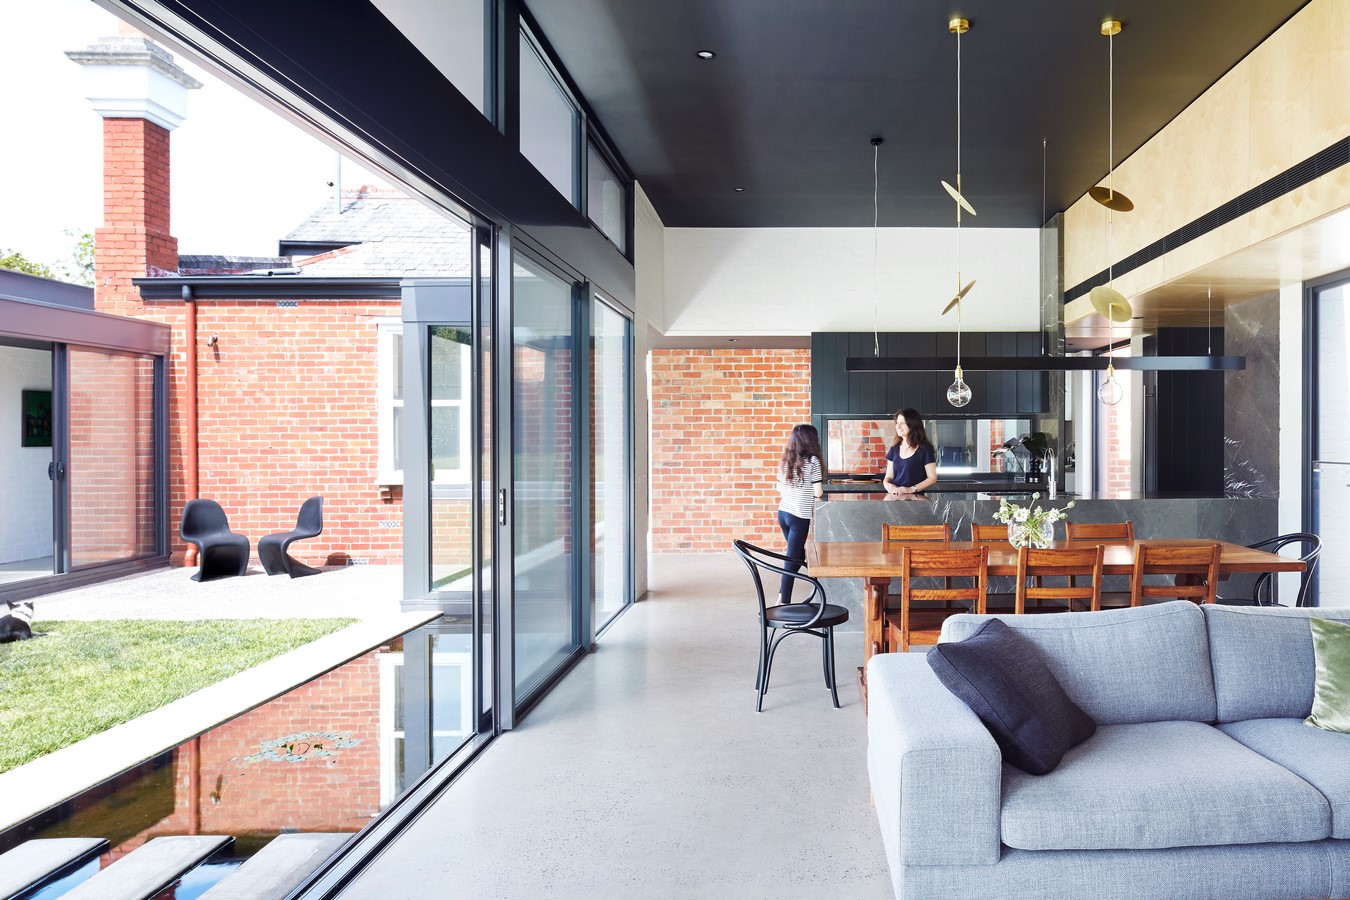 Pond House, 'Marrandillas' by Nic Owen Architects - Sheet1